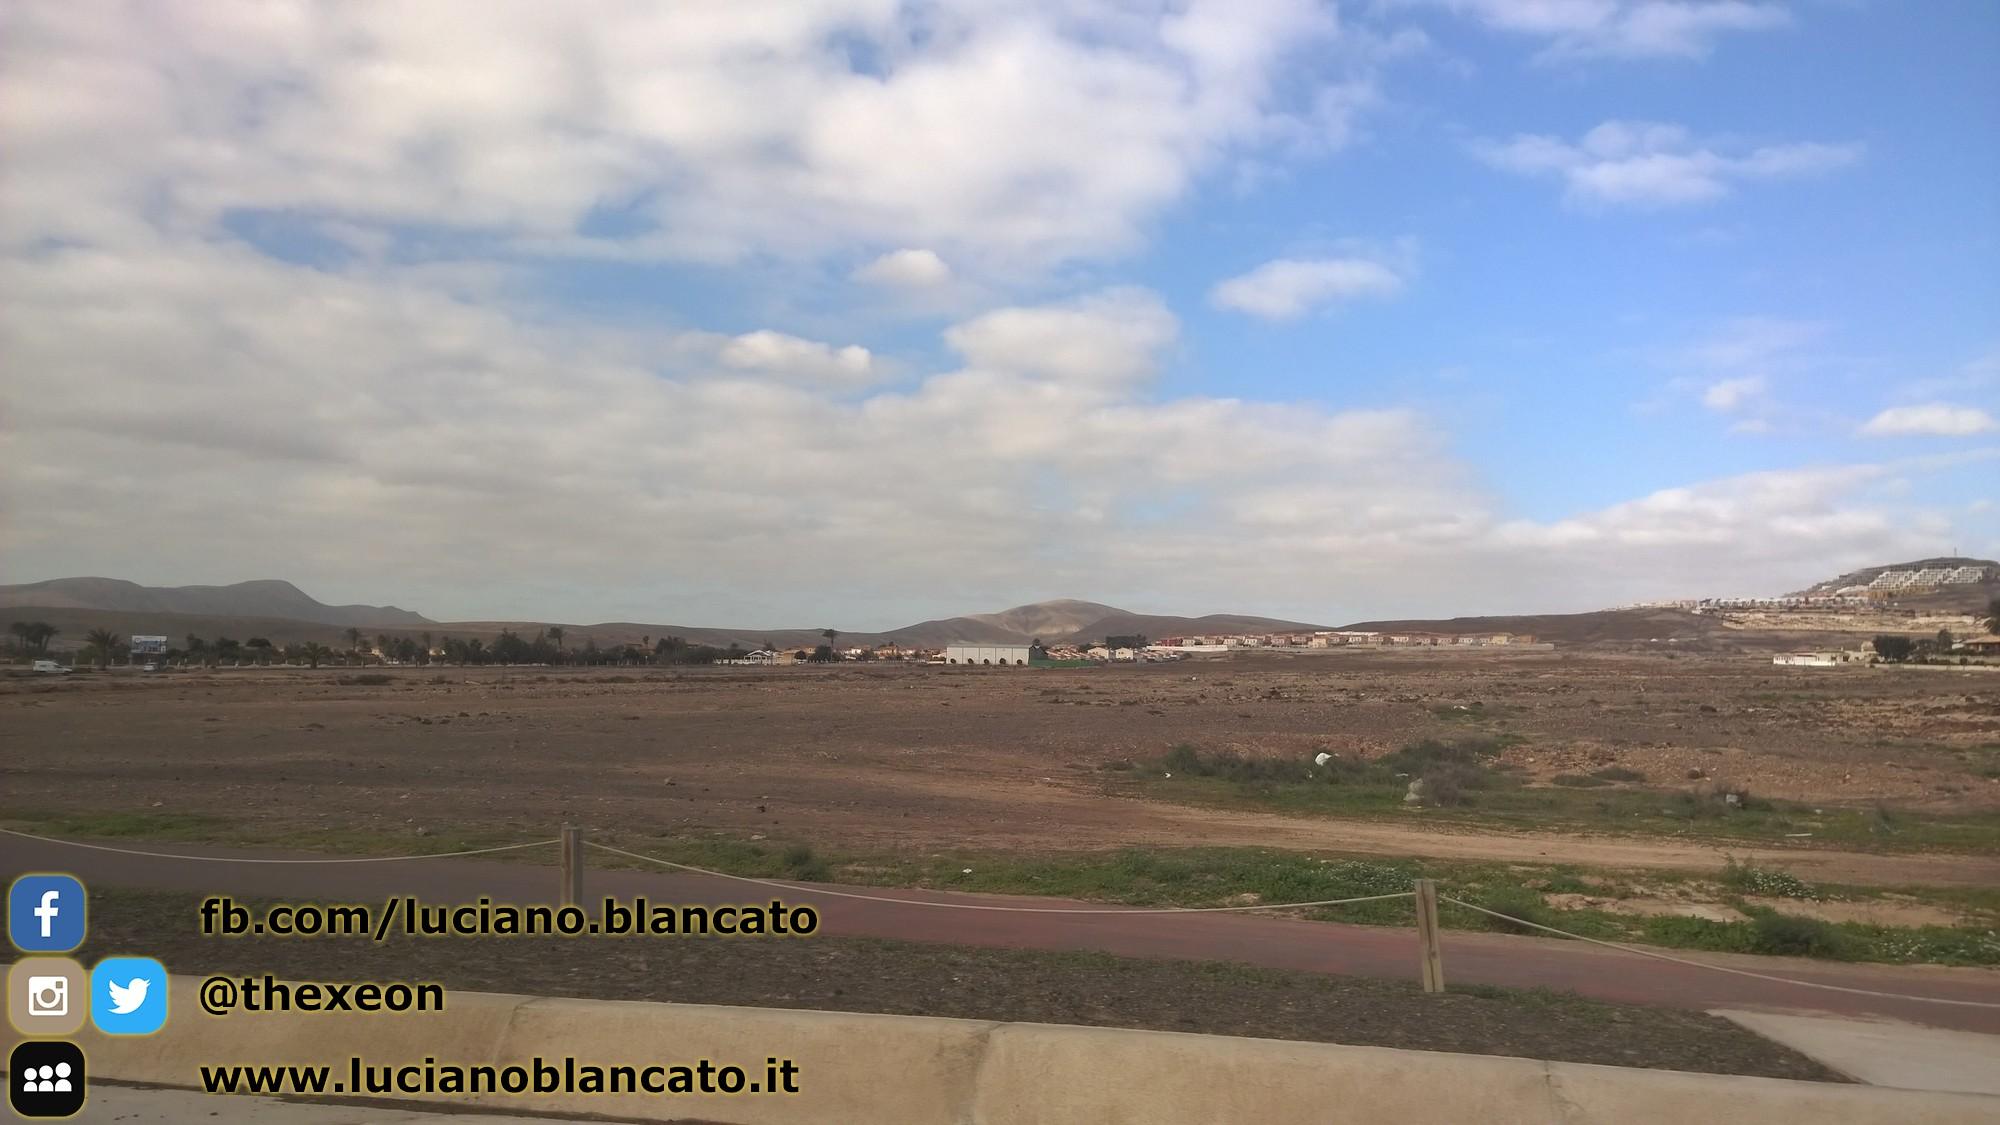 Fuerteventura - Spagna - 2014 - foto n. 0035